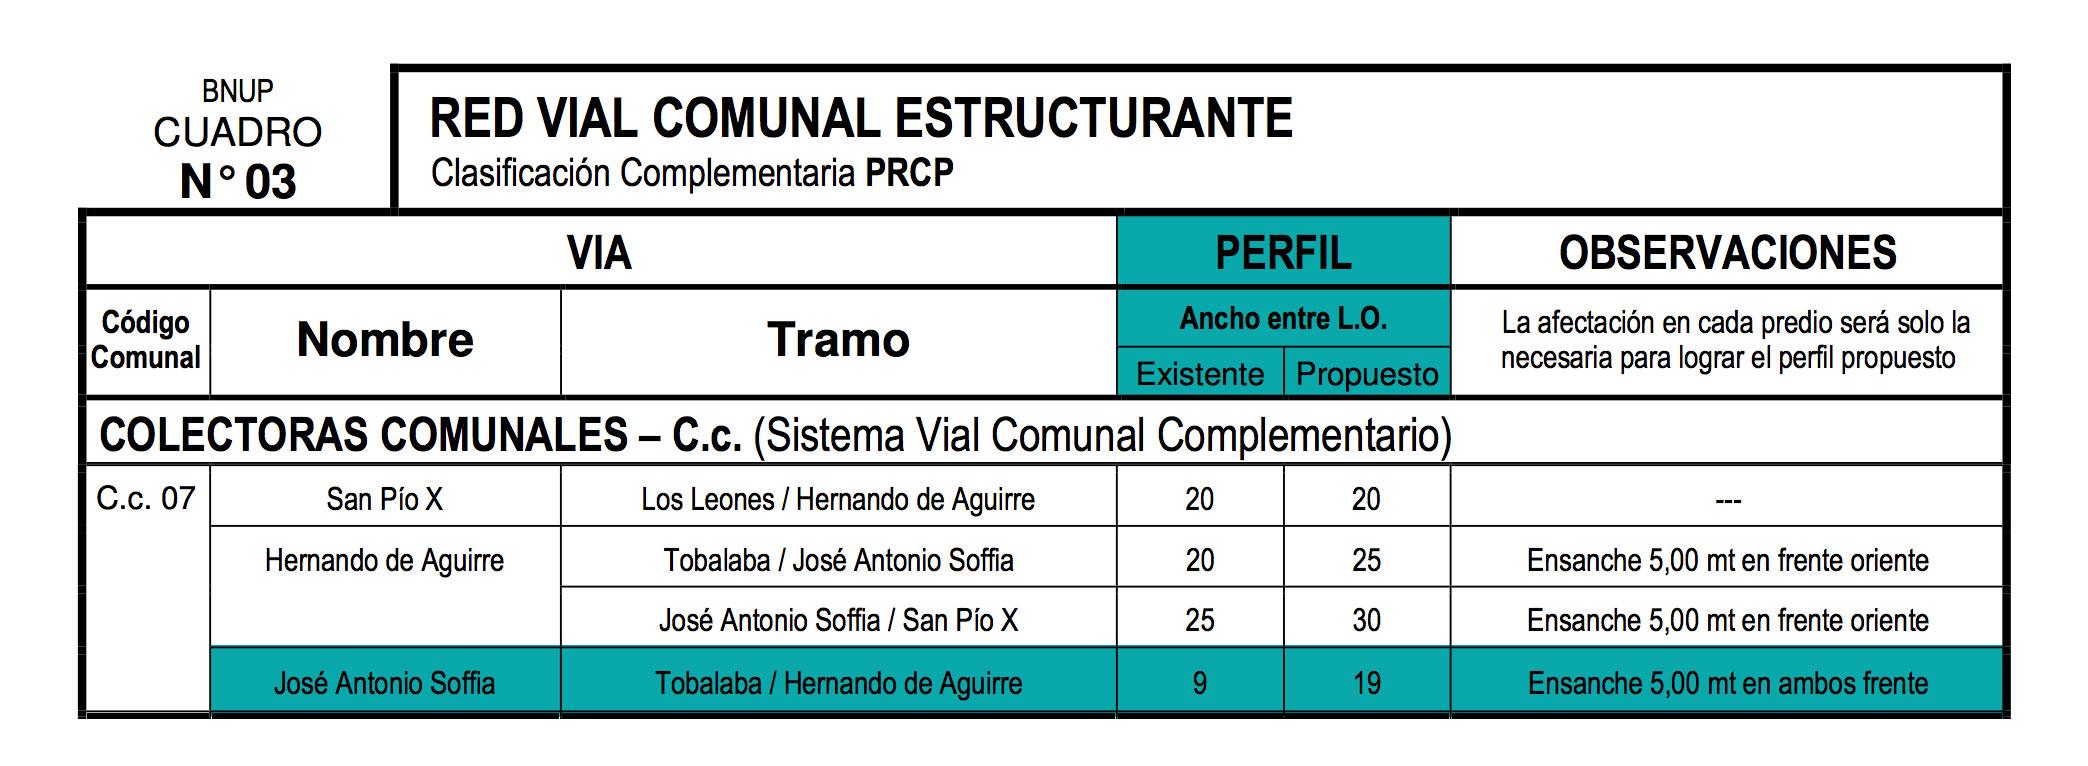 Red Vial Comunal Estructurante, Providencia,OGUC, Chile